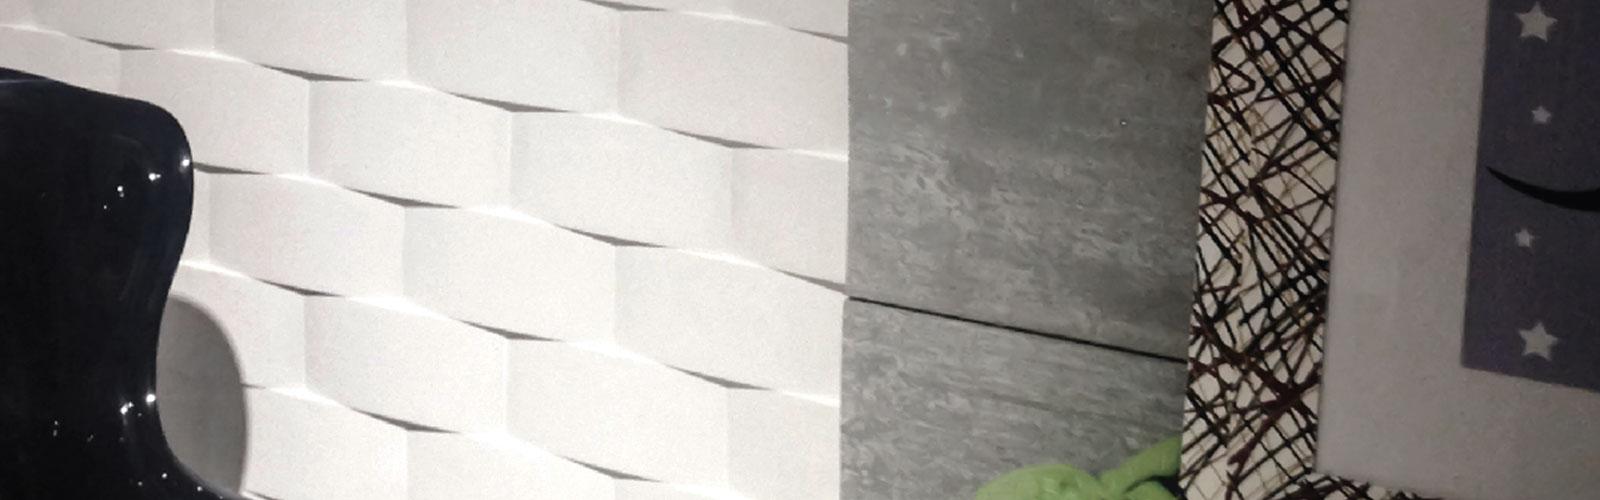 Royal Design 3D | Rivestimenti 3D, pietra ecologica, pietra da rivestimento